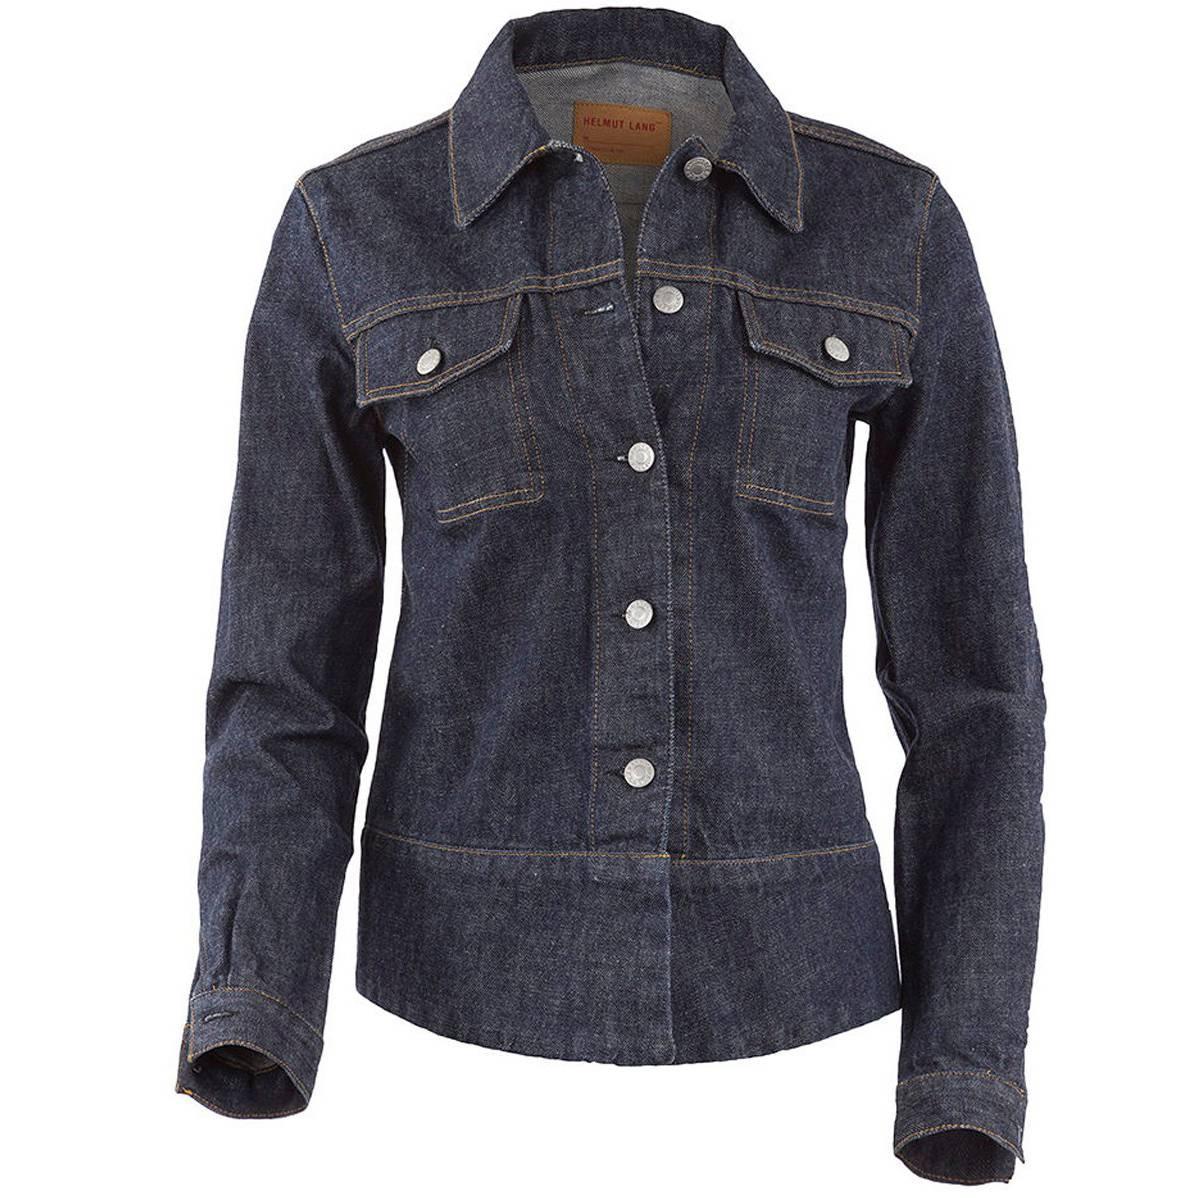 1990's Iconic Helmut Lang Raw Denim Jacket NWT